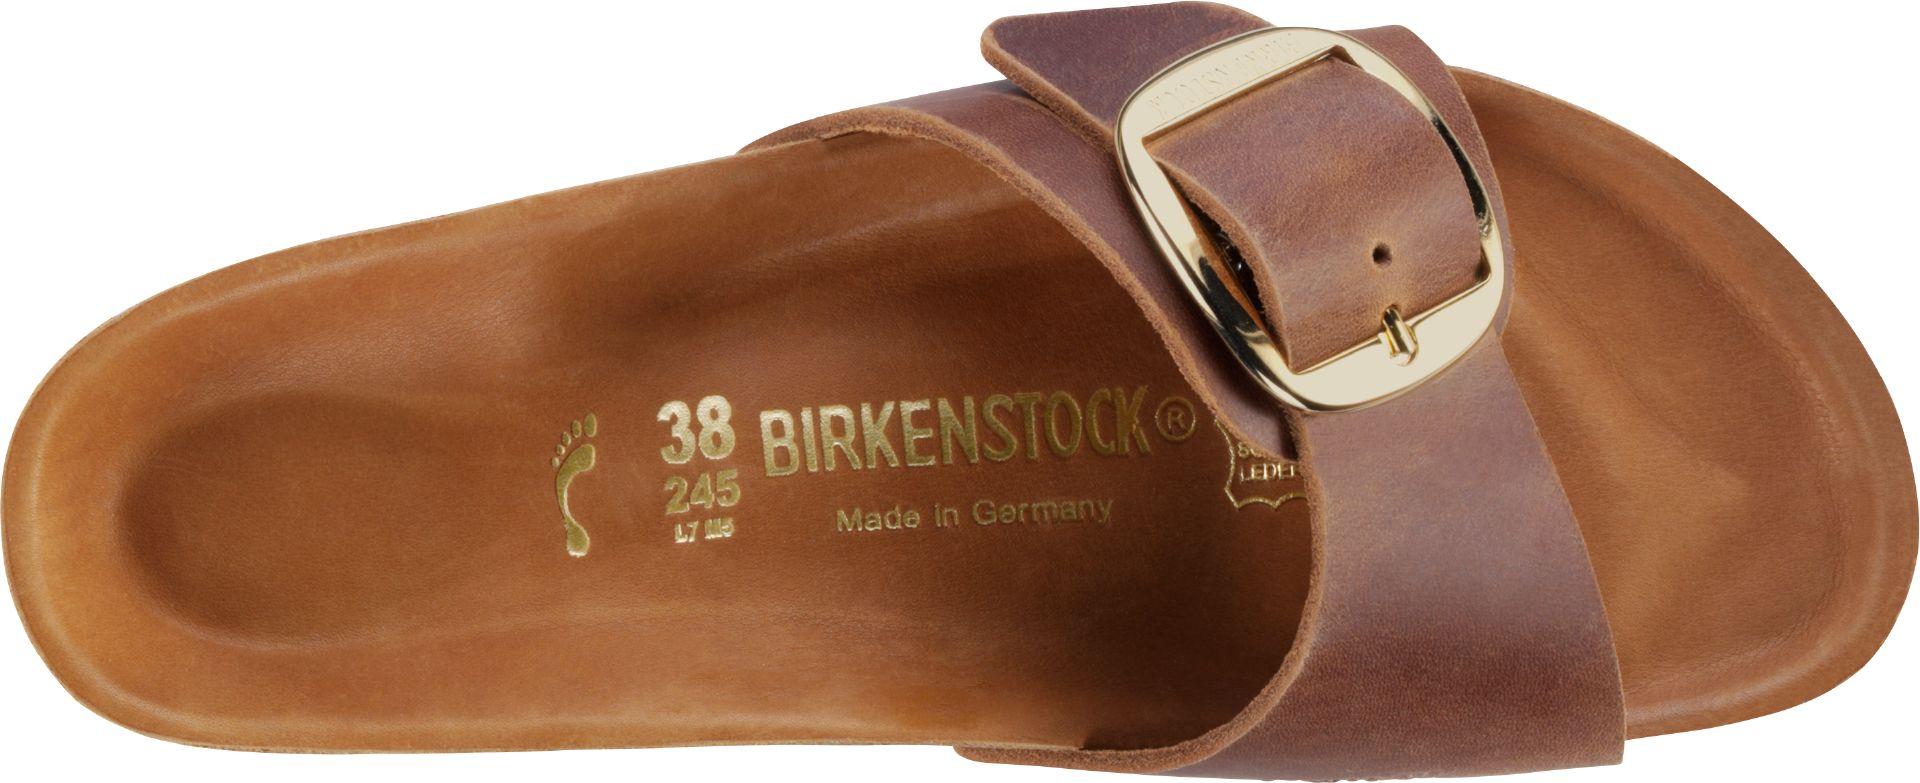 Birkenstock Madrid Big Buckle sandal, cognac, 39